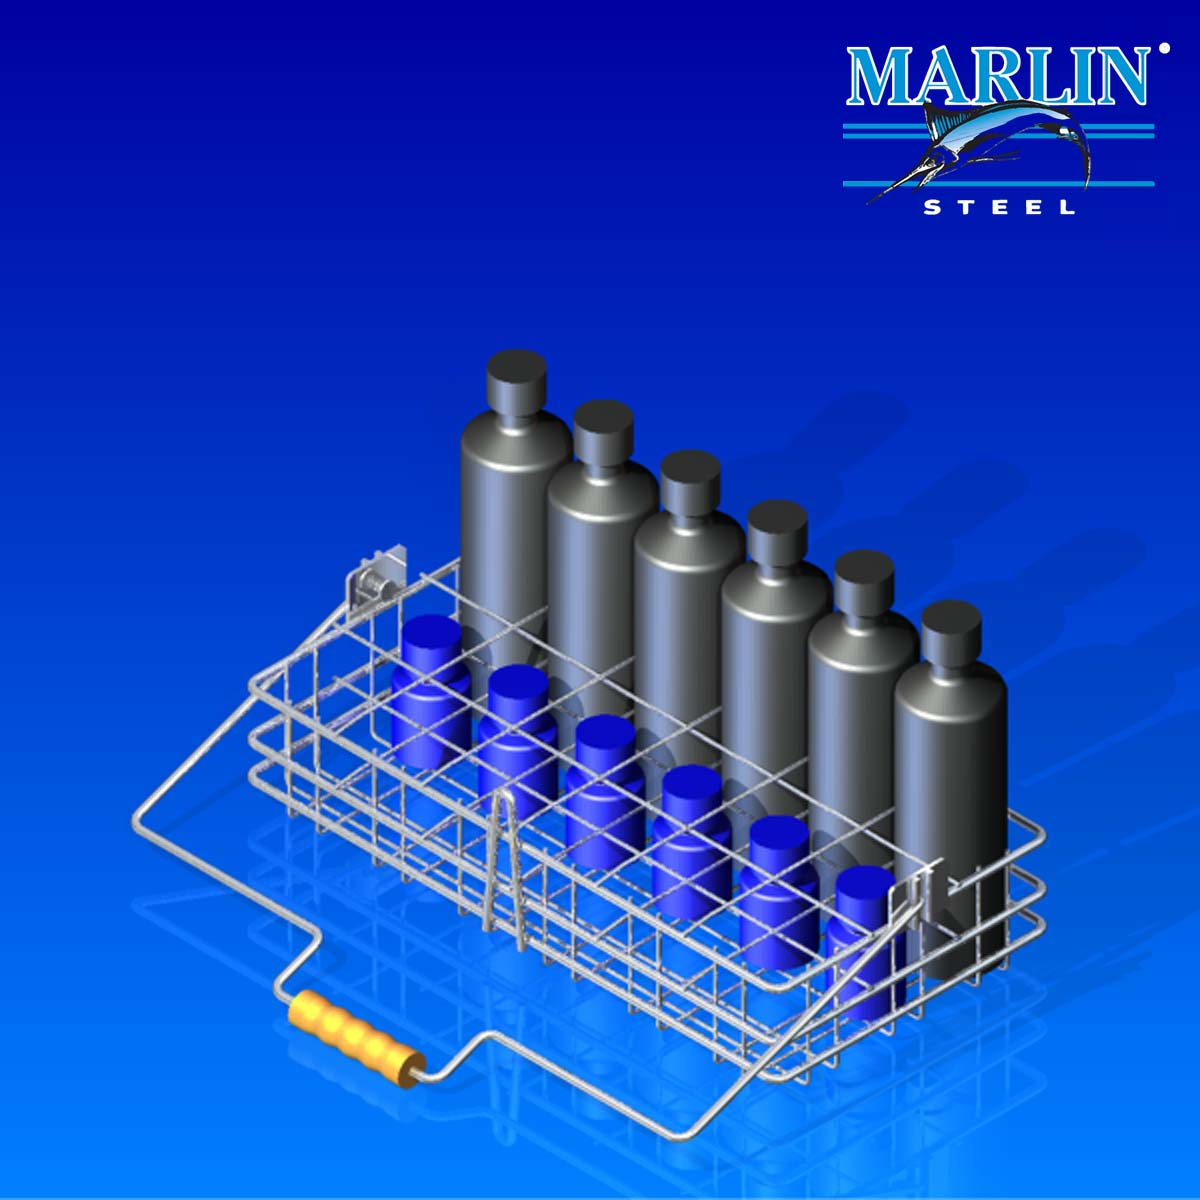 Wire Cleaning Baskets Marlin Steel